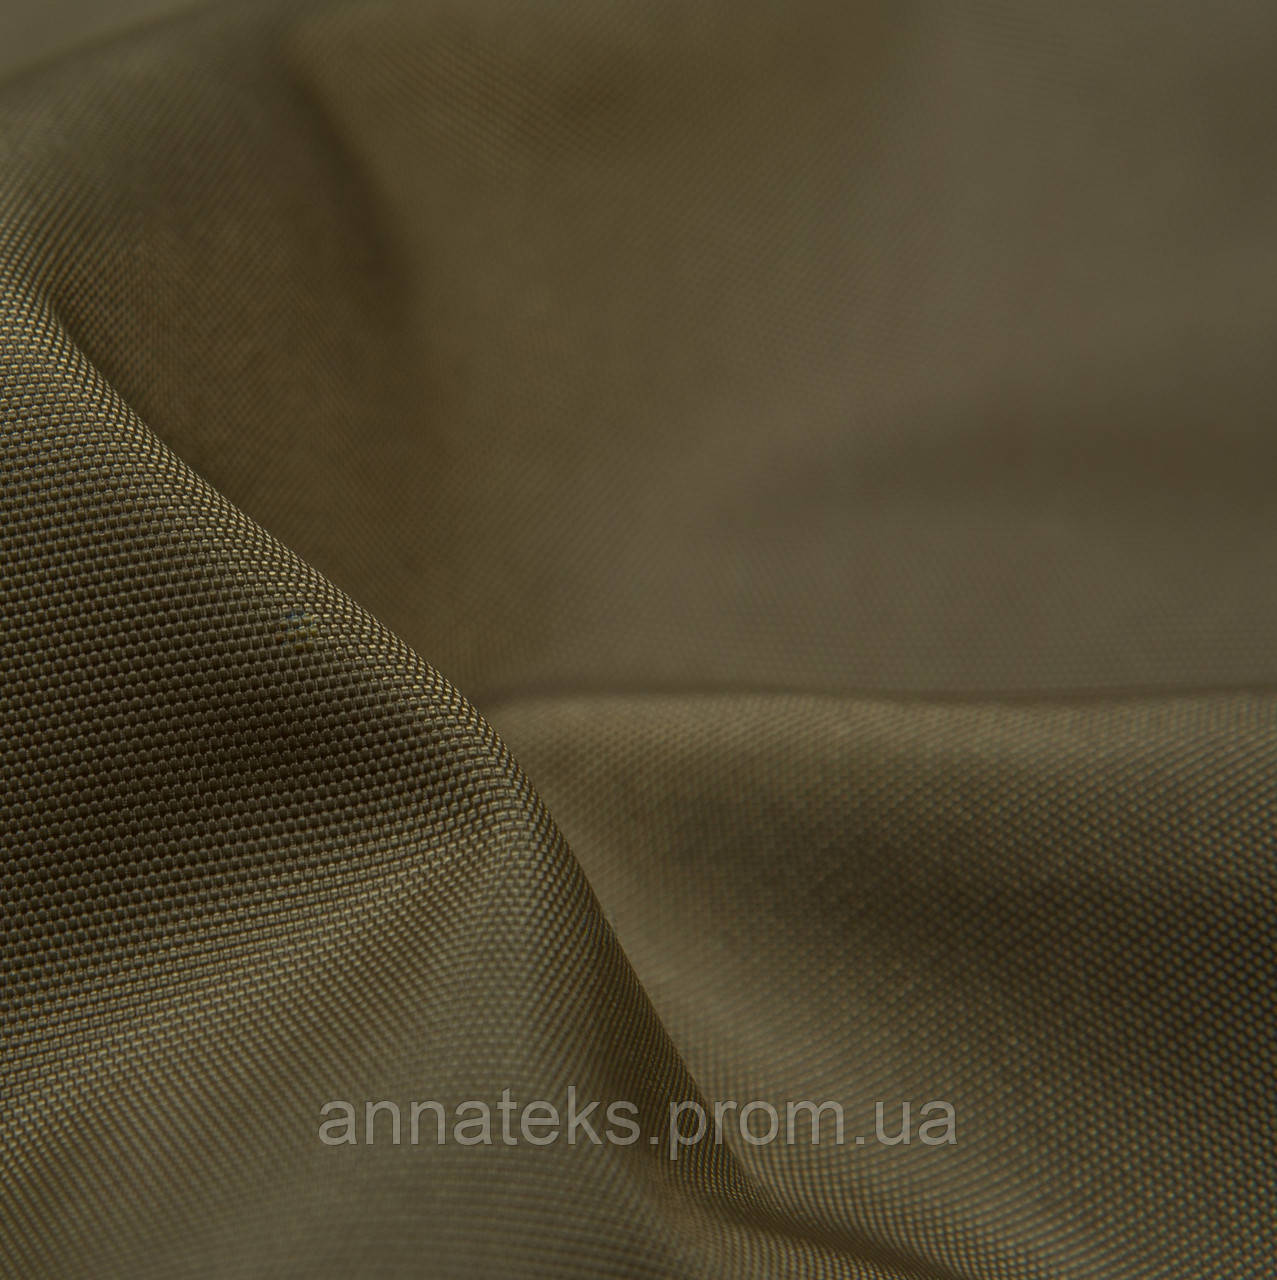 Ткань  Оксфорд-135 арт. 129937 №18-0920  ТРХ  тем.Оливковый 150СМ